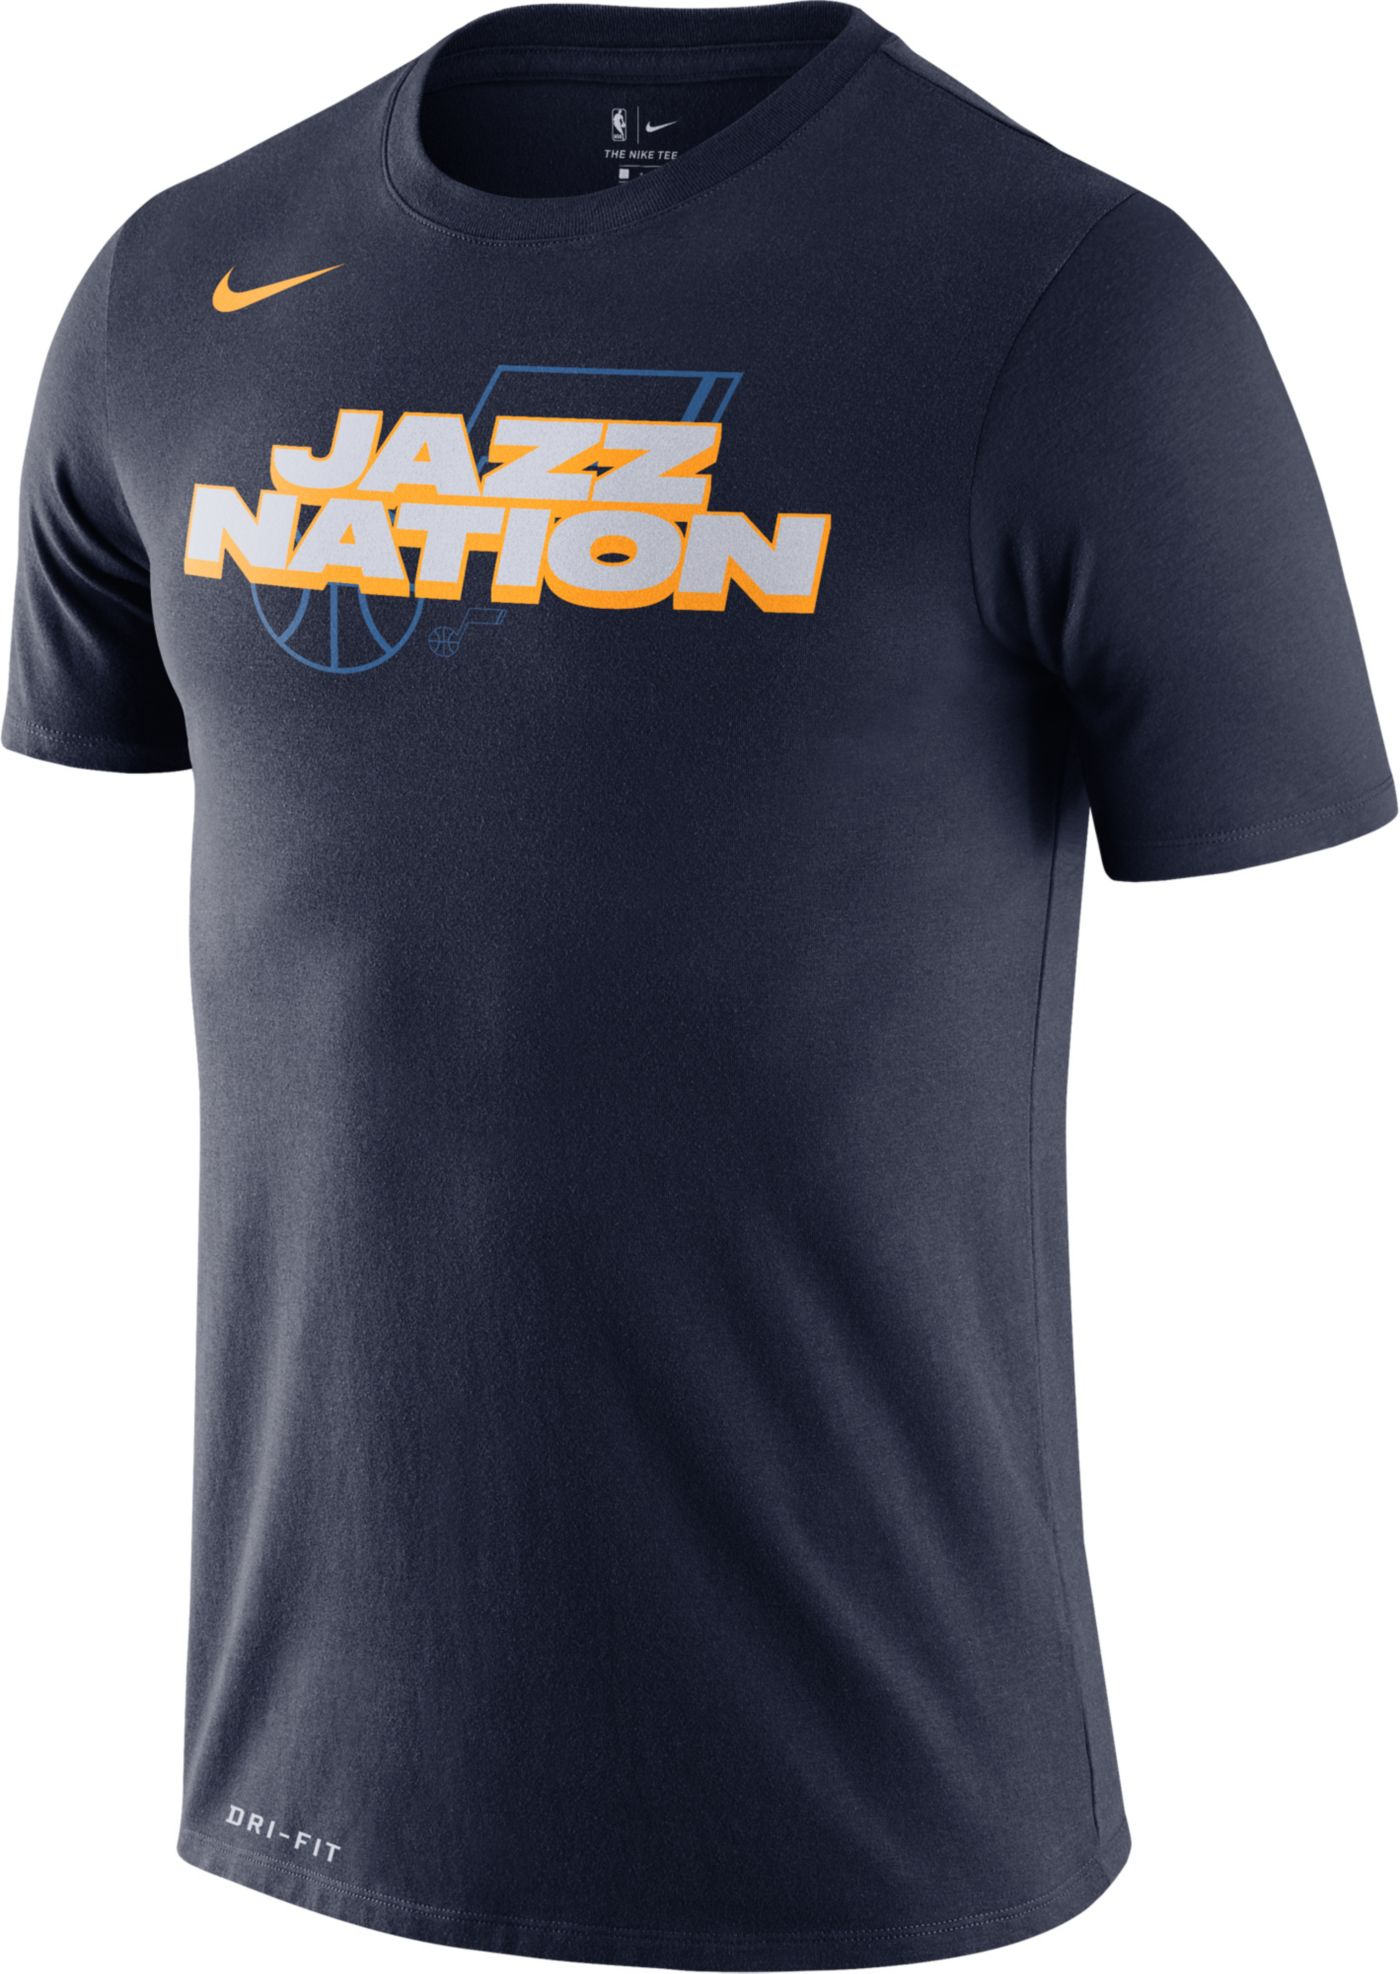 Nike Men's Utah Jazz Dri-FIT Mantra T-Shirt